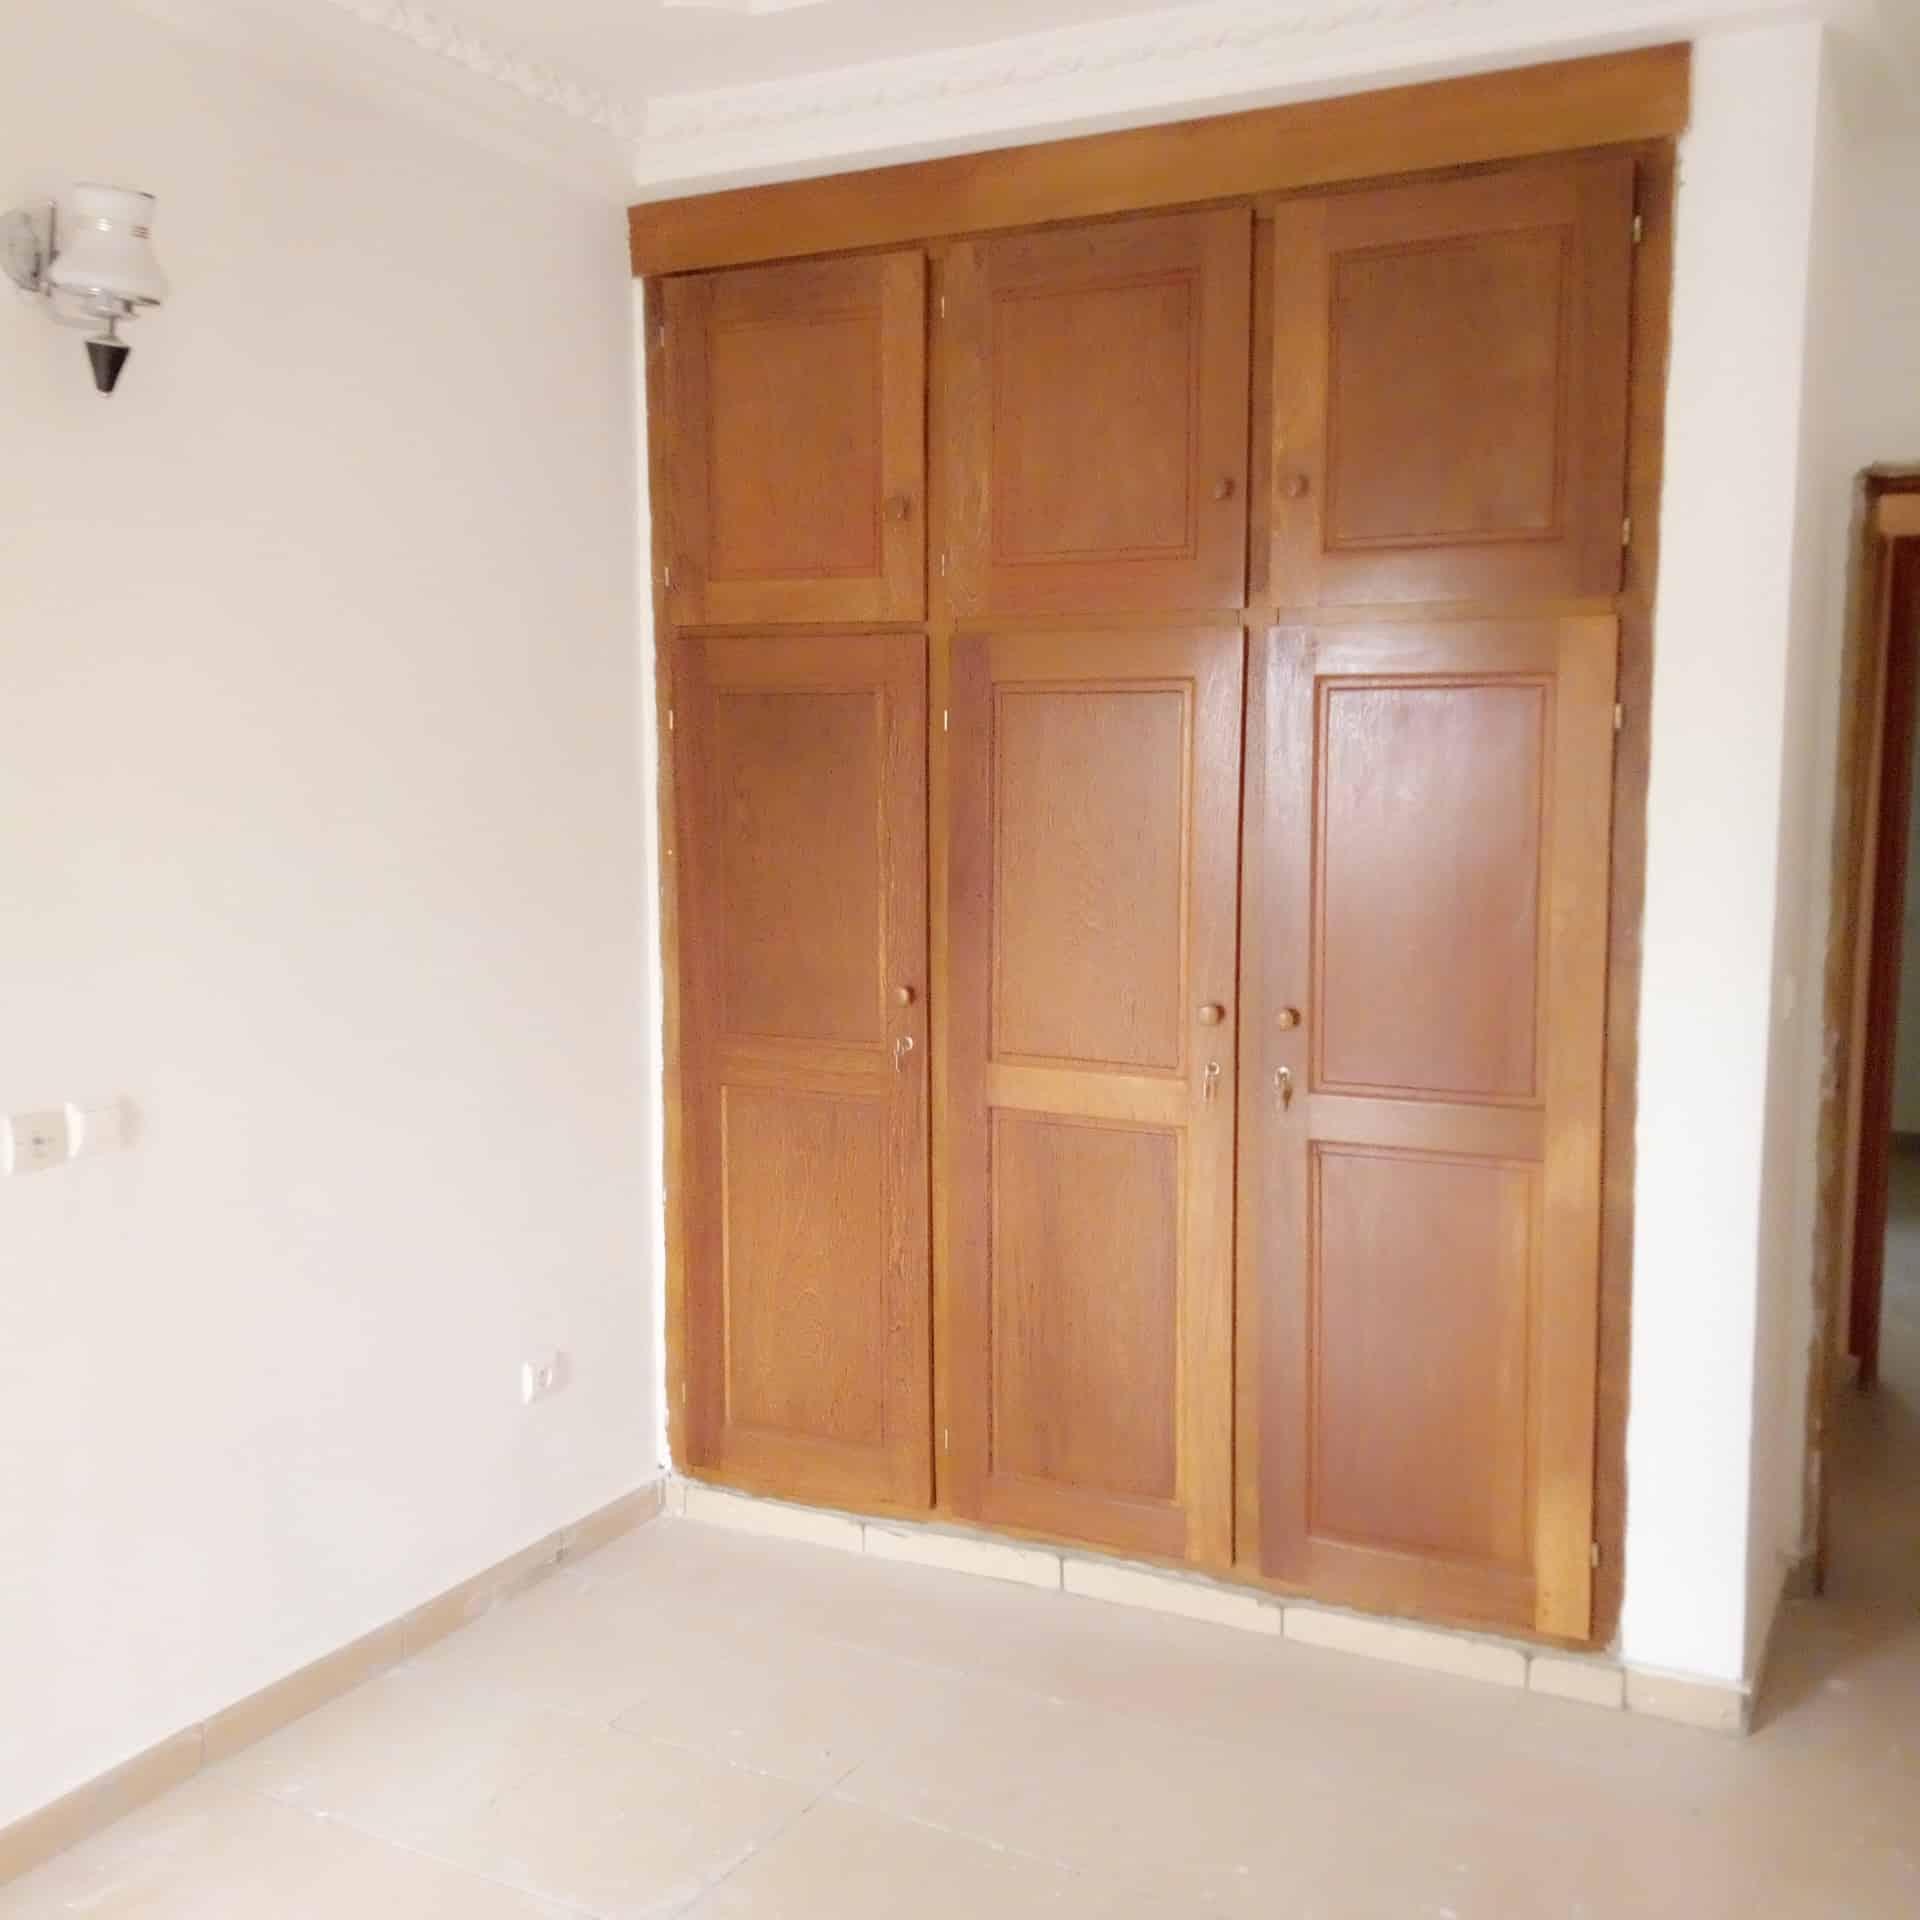 Apartment to rent - Douala, Makepe, Ver BM - 1 living room(s), 2 bedroom(s), 2 bathroom(s) - 150 000 FCFA / month